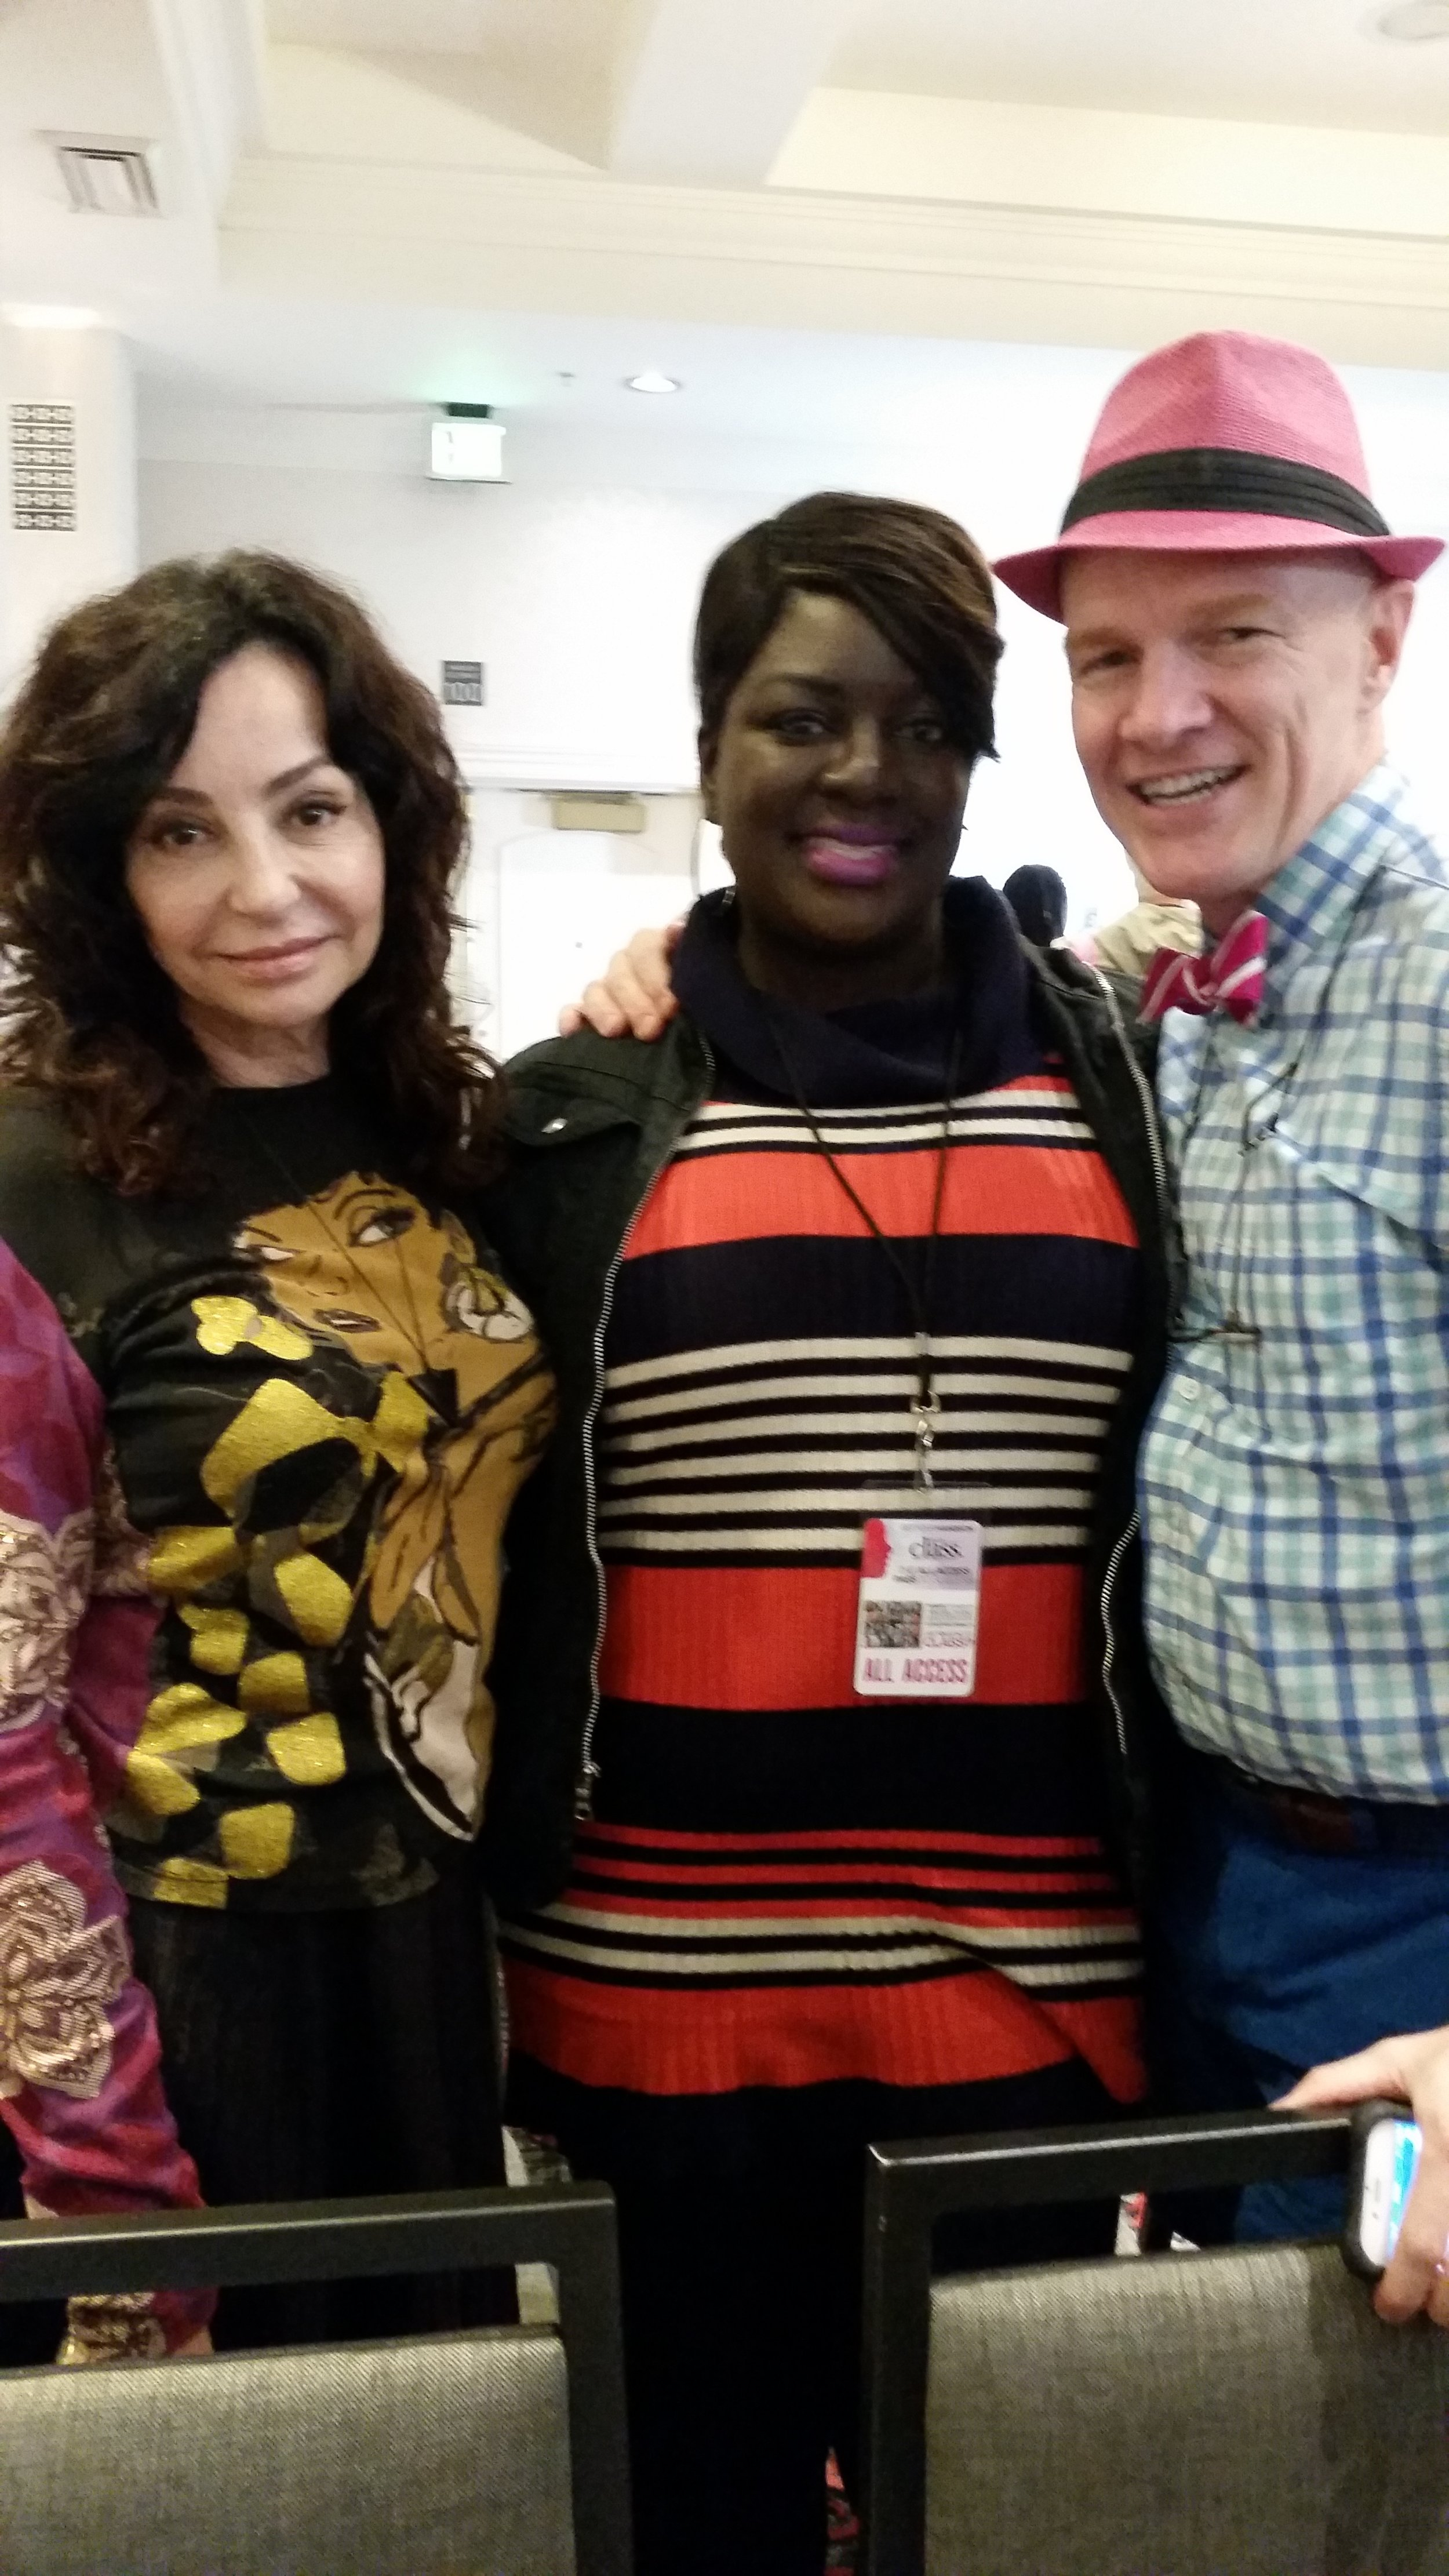 With Stephen Dimmick & Eugenia Weston (the original Brow Guru)